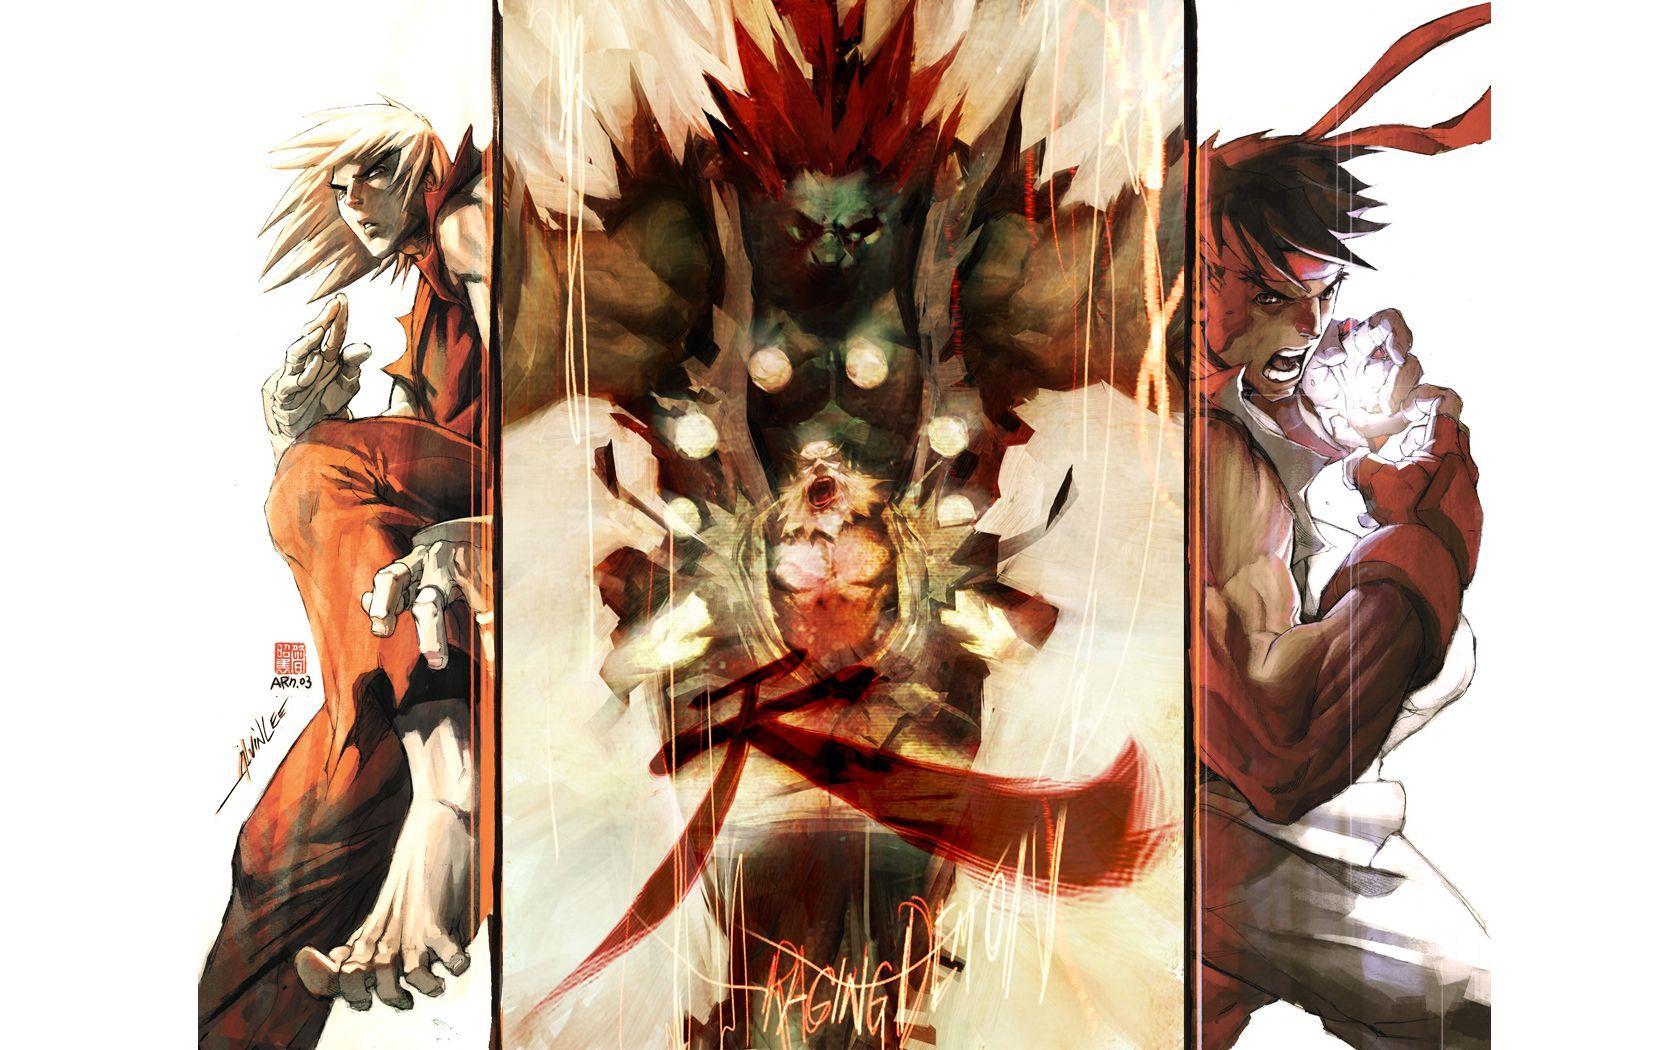 Street Fighter 4K Wallpapers - Top Free Street Fighter 4K